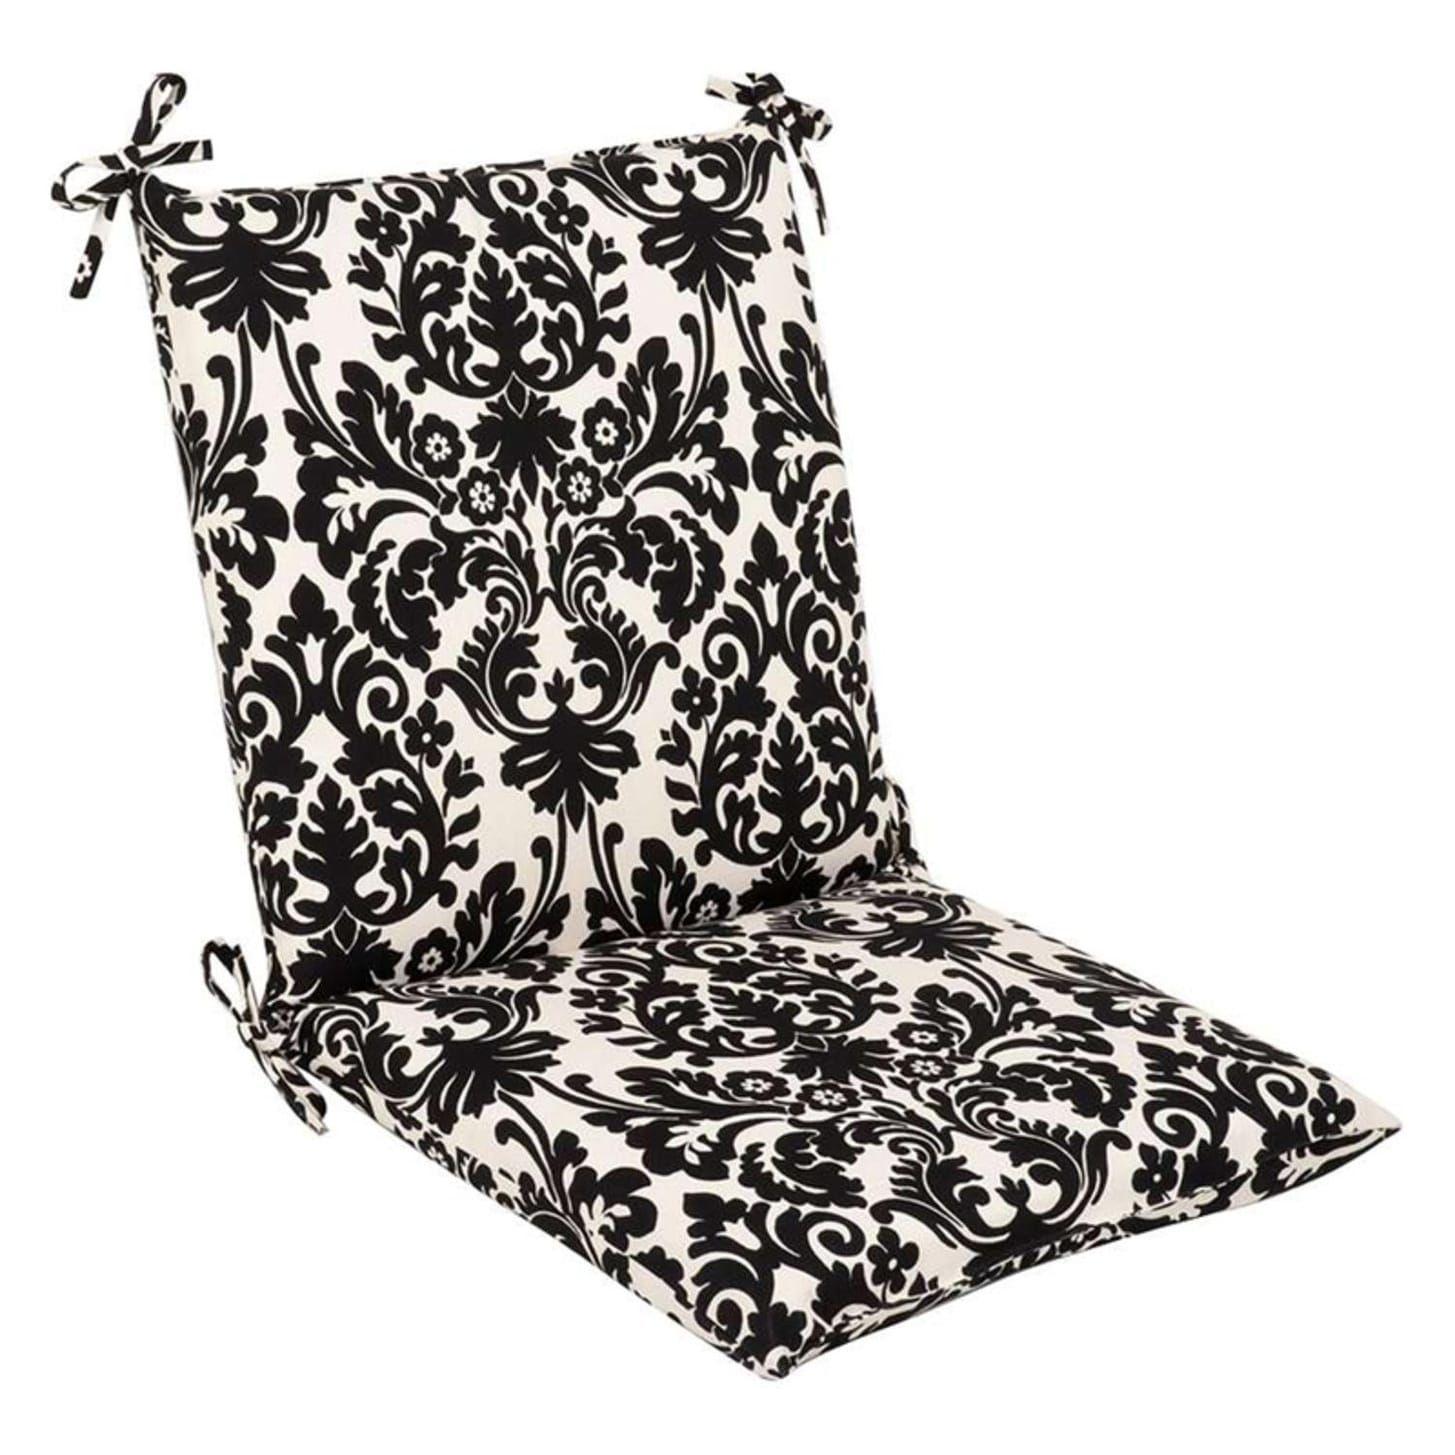 Outdoor Patio Furniture Mid Back Chair Cushion - Dramatic Black & Cream Damask, Outdoor Cushion